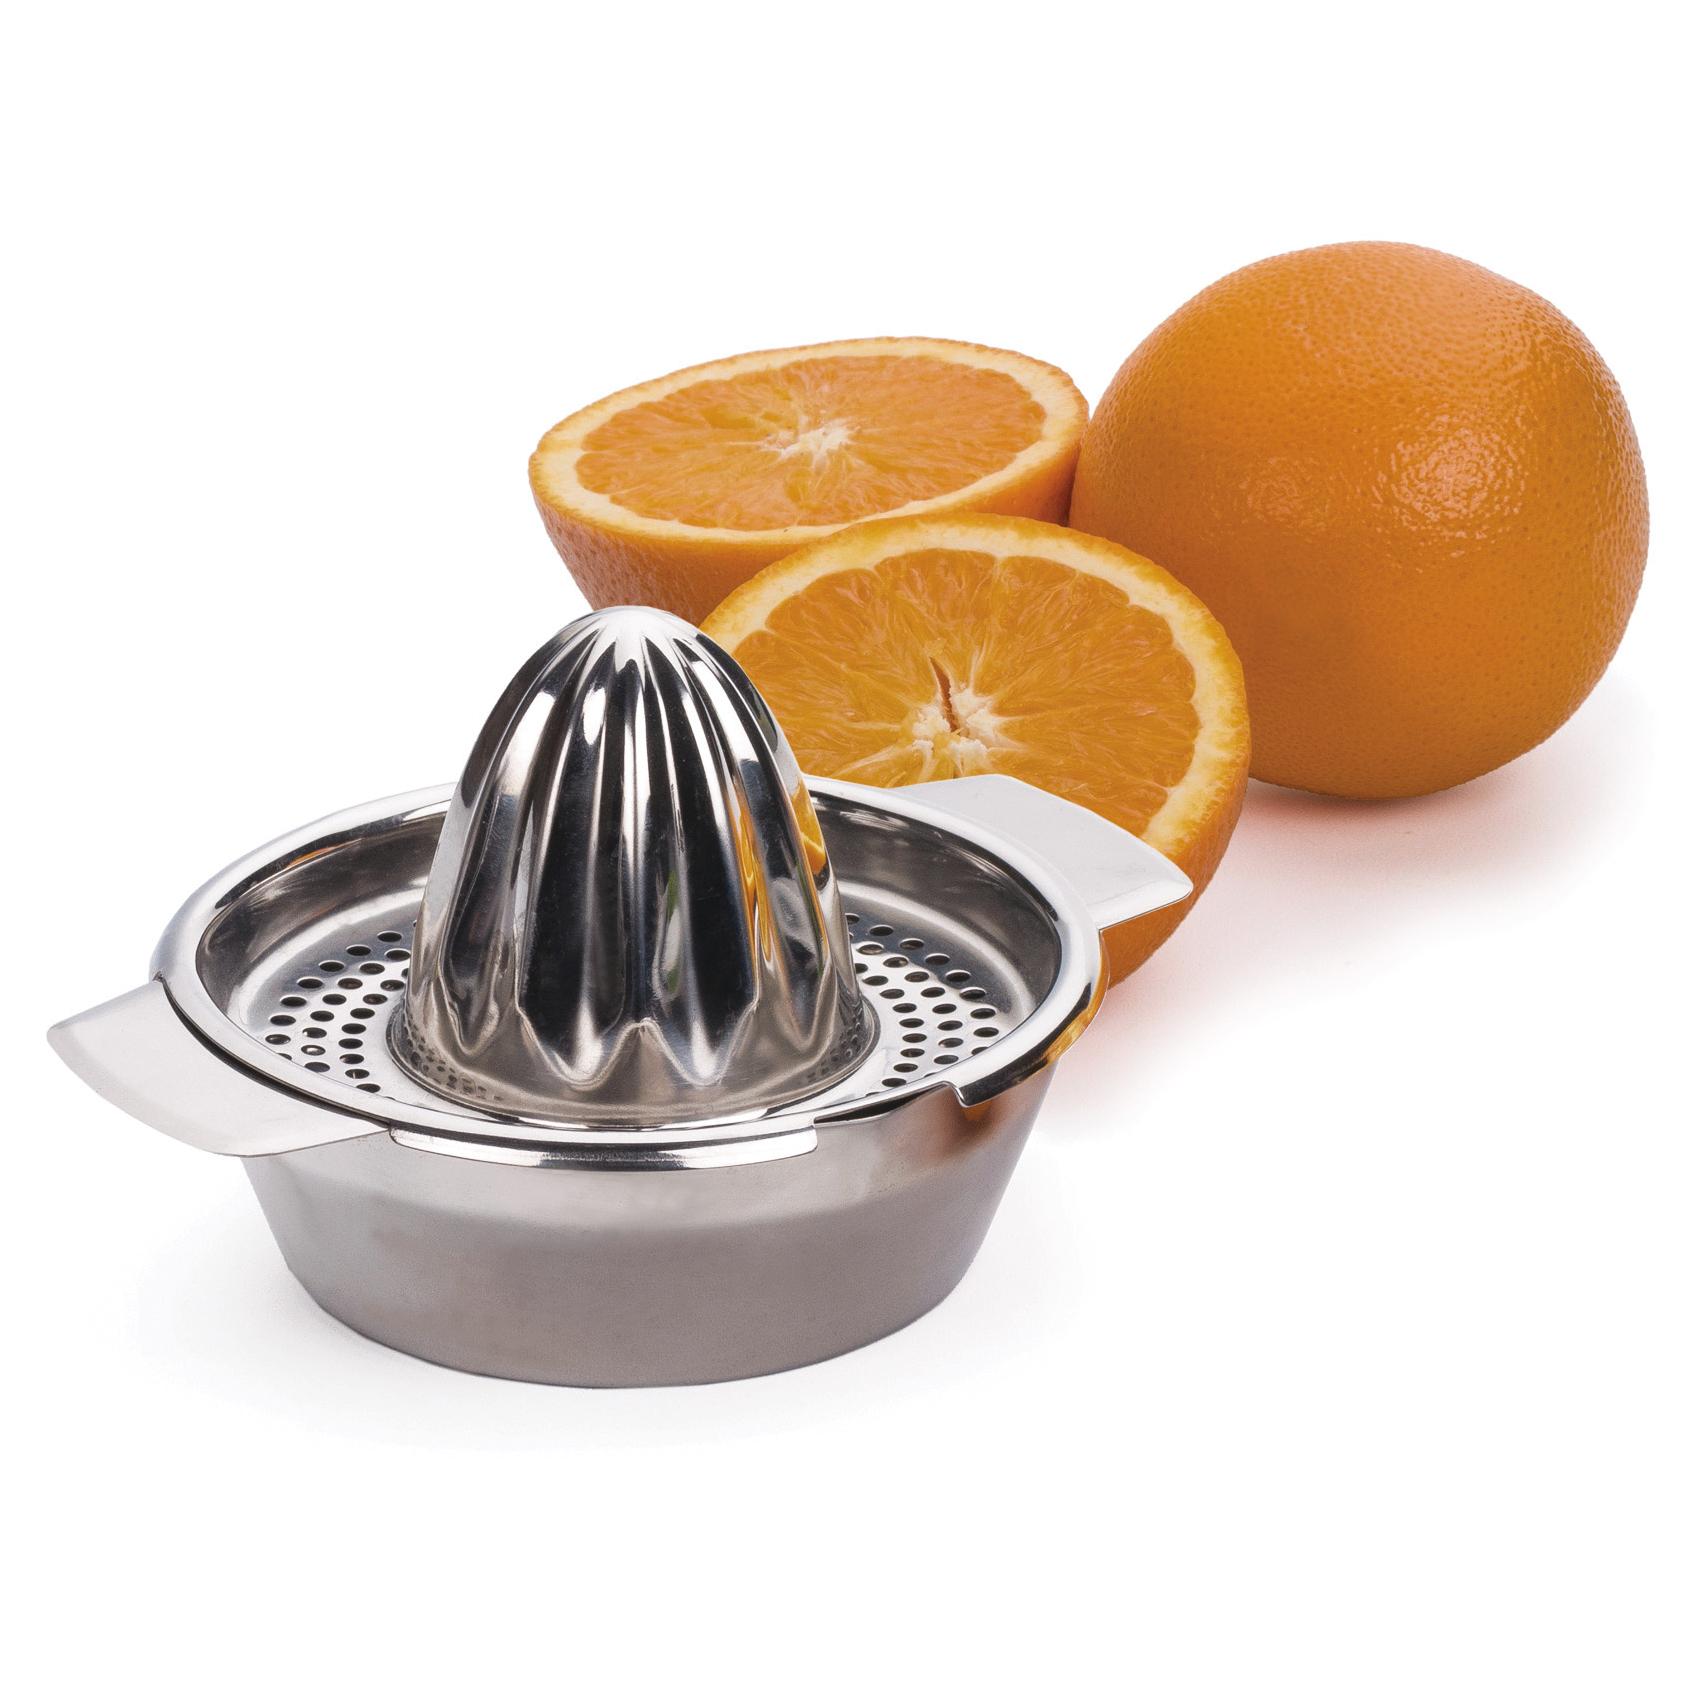 Endurance Citrus Juicer